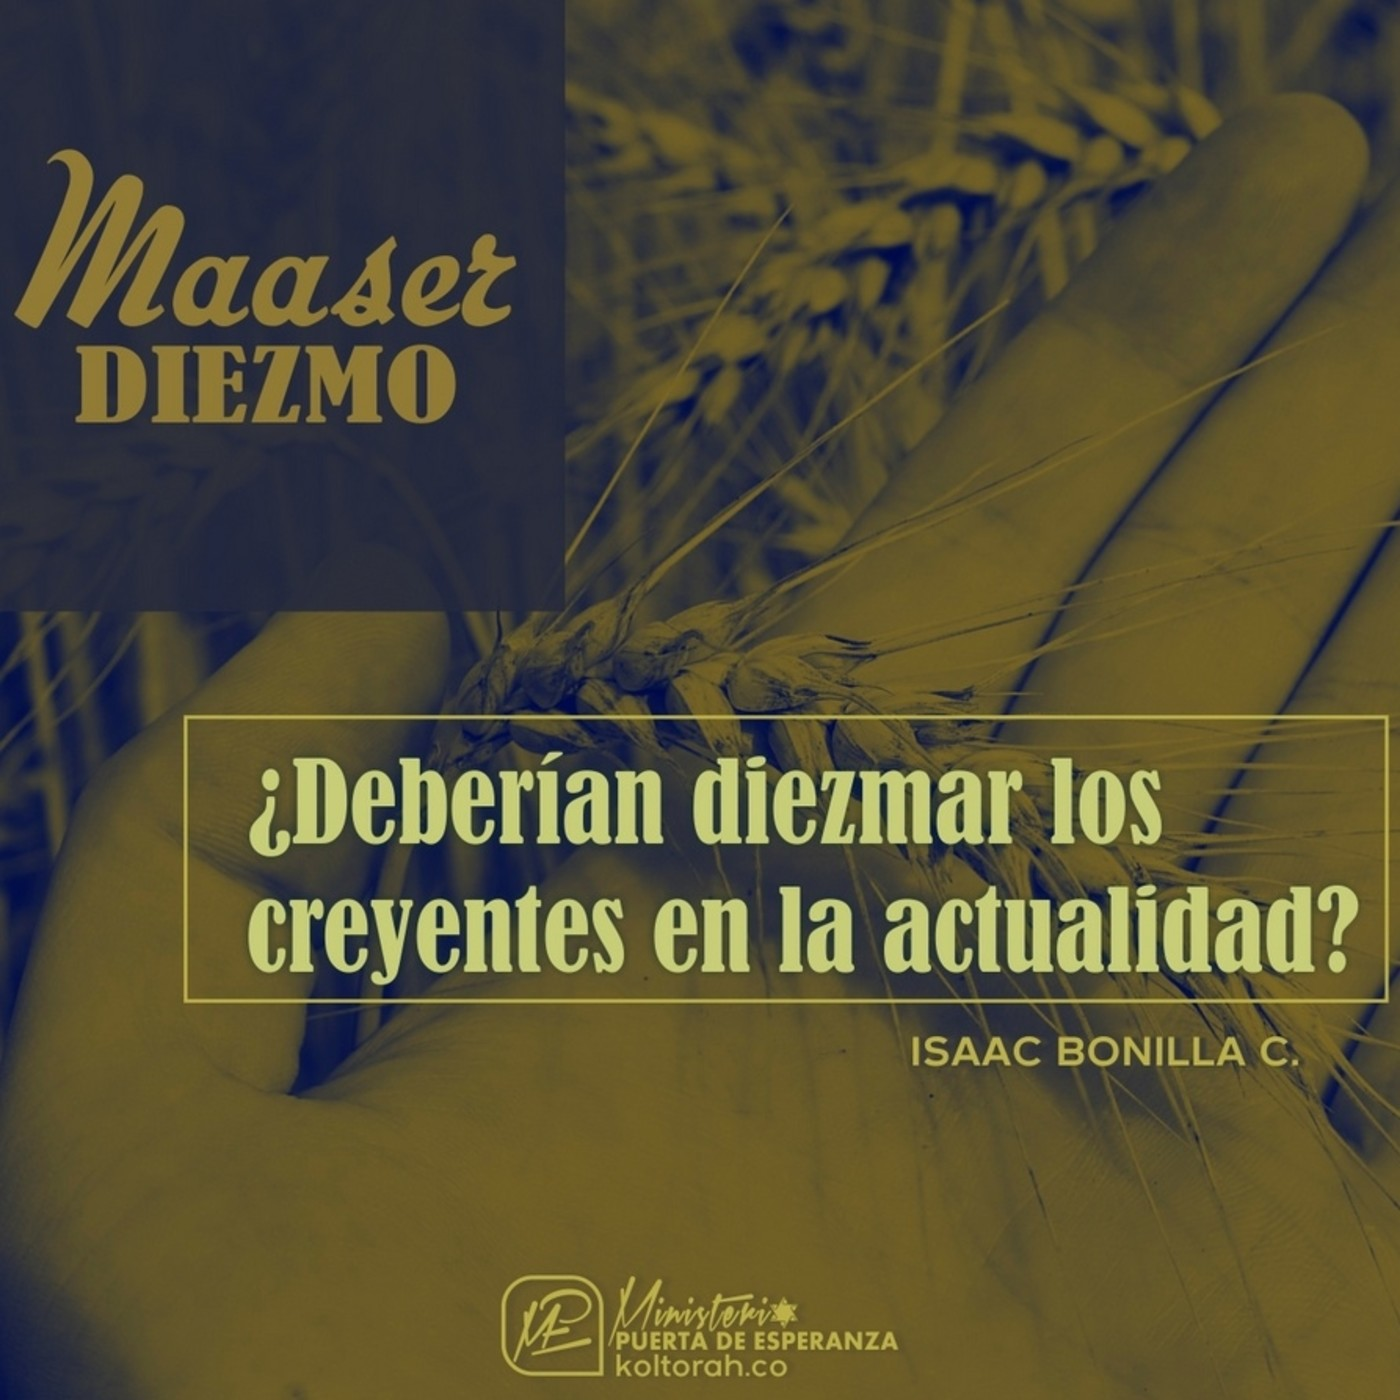 Isaac Bonilla